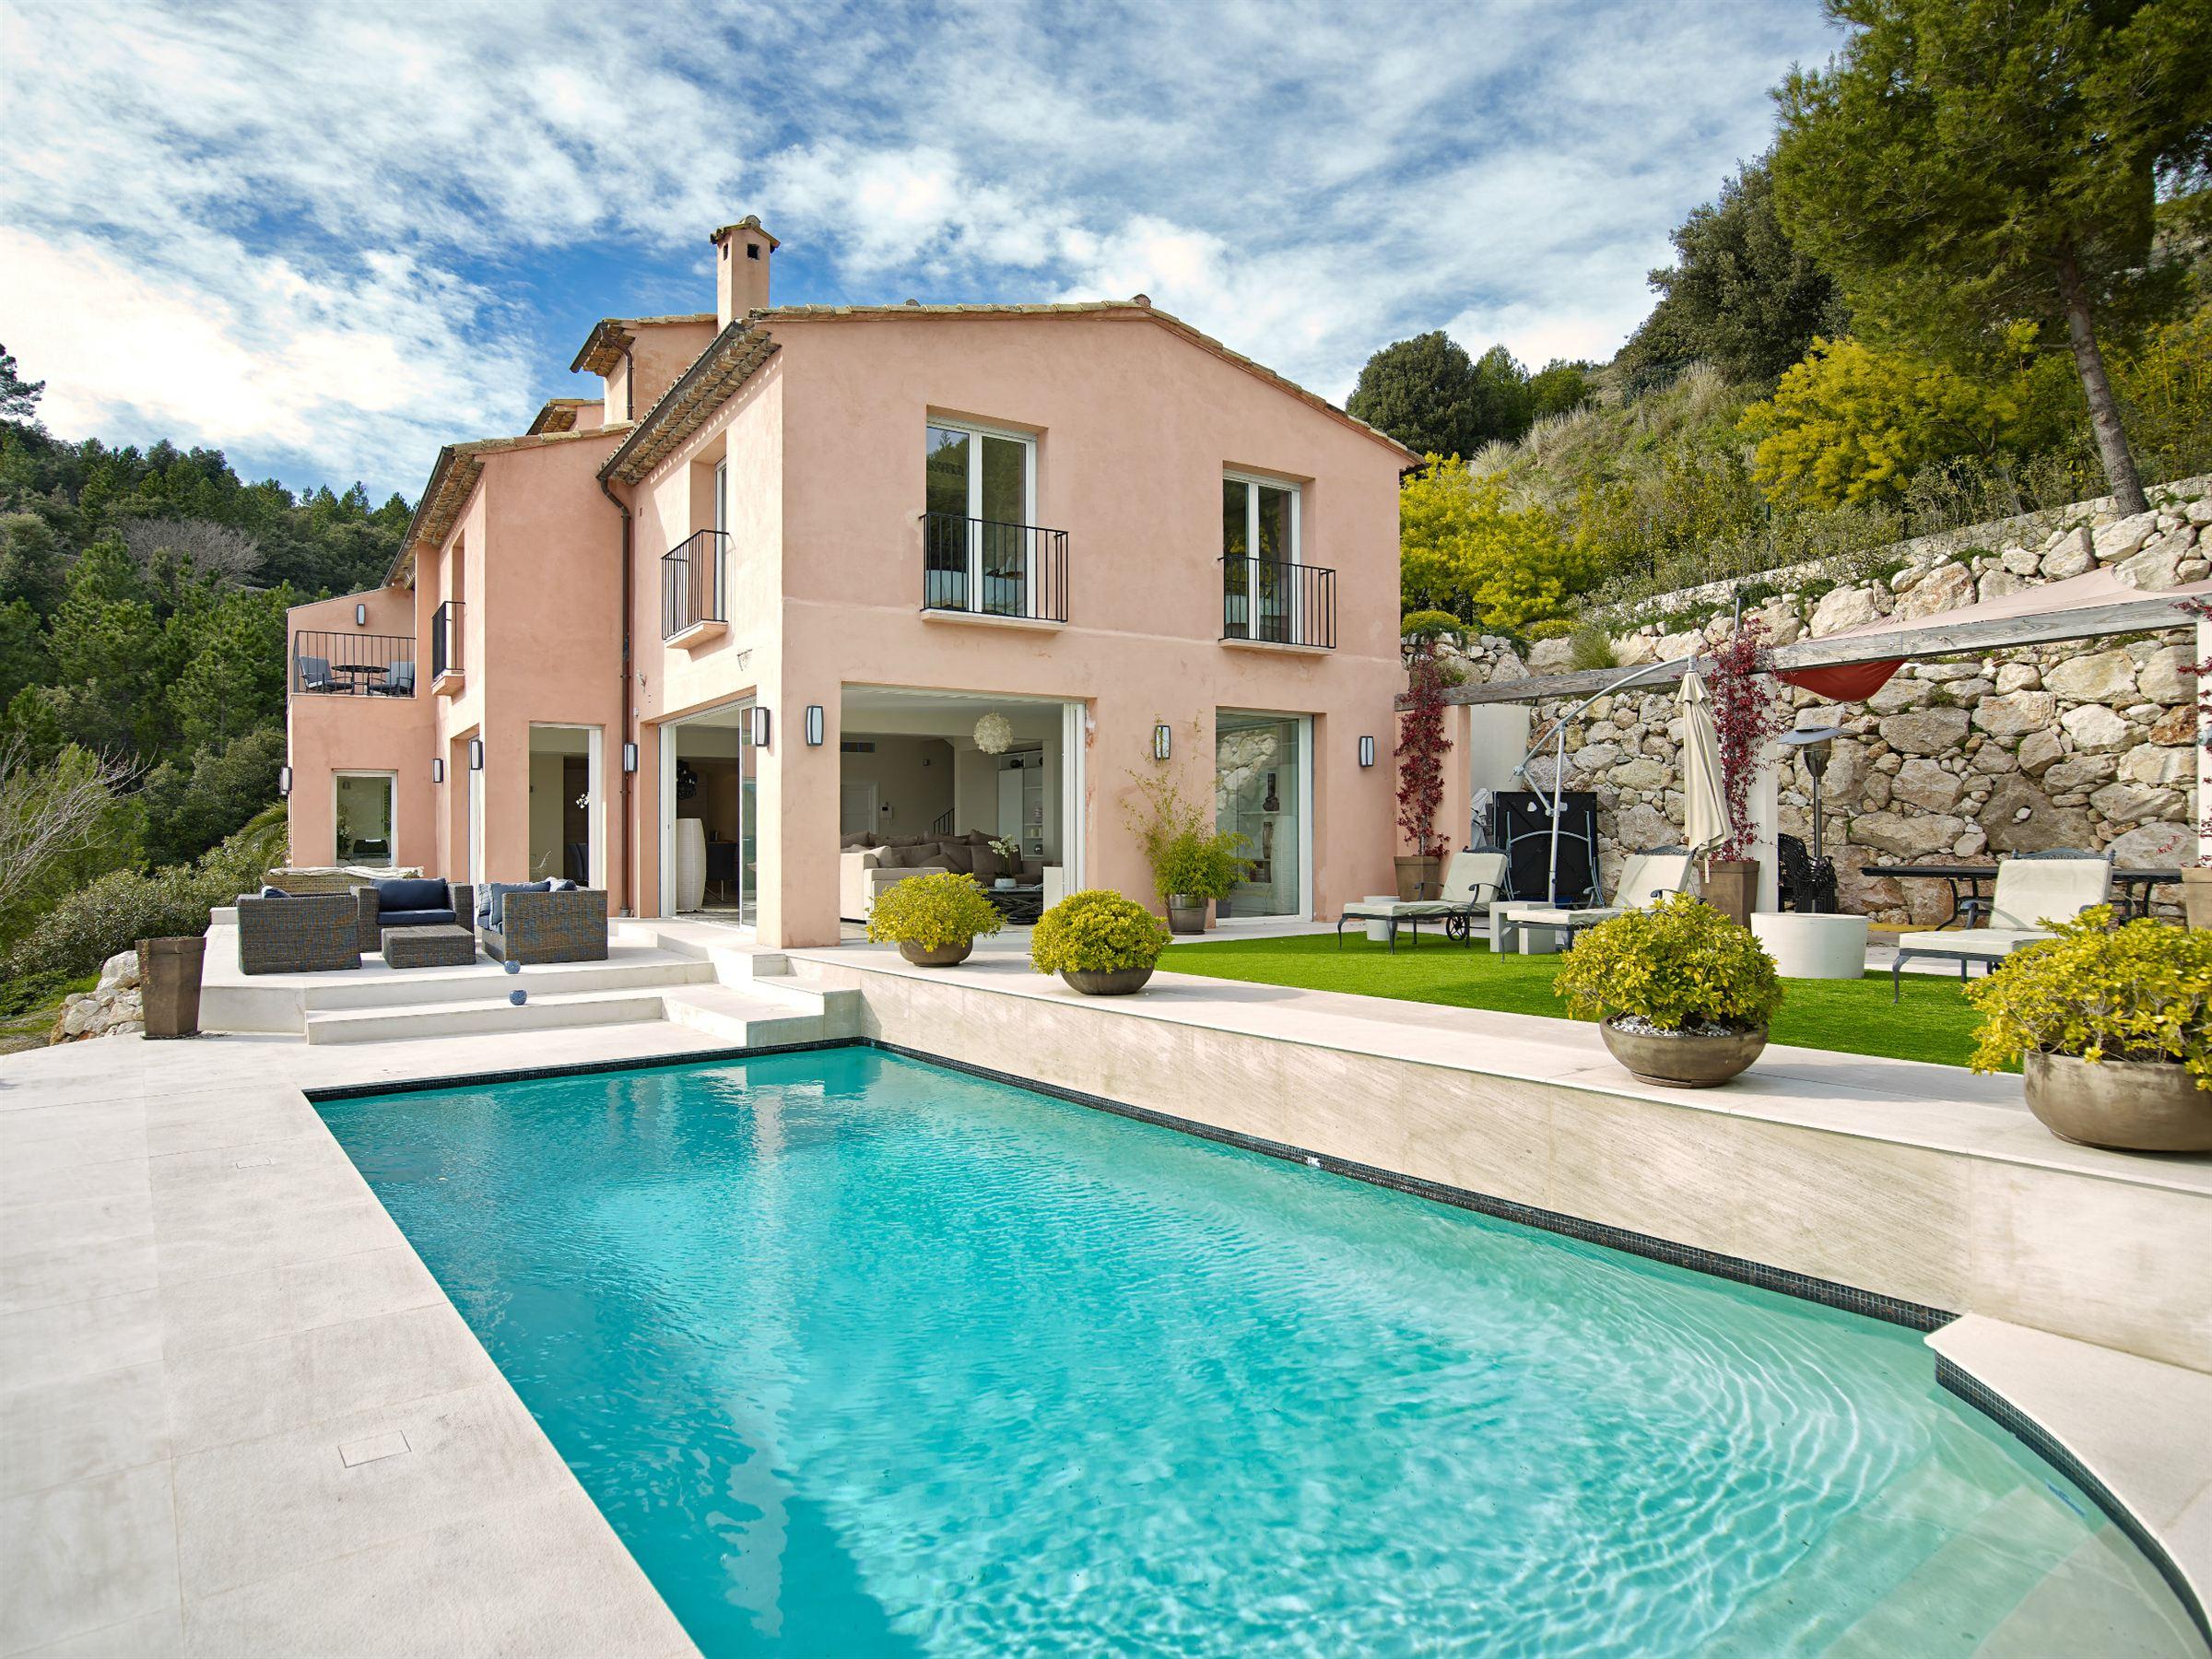 Einfamilienhaus für Verkauf beim Provencal style villa with panoramic sea view overlooking Eze sur Mer Eze, Provence-Alpes-Cote D'Azur 06360 Frankreich